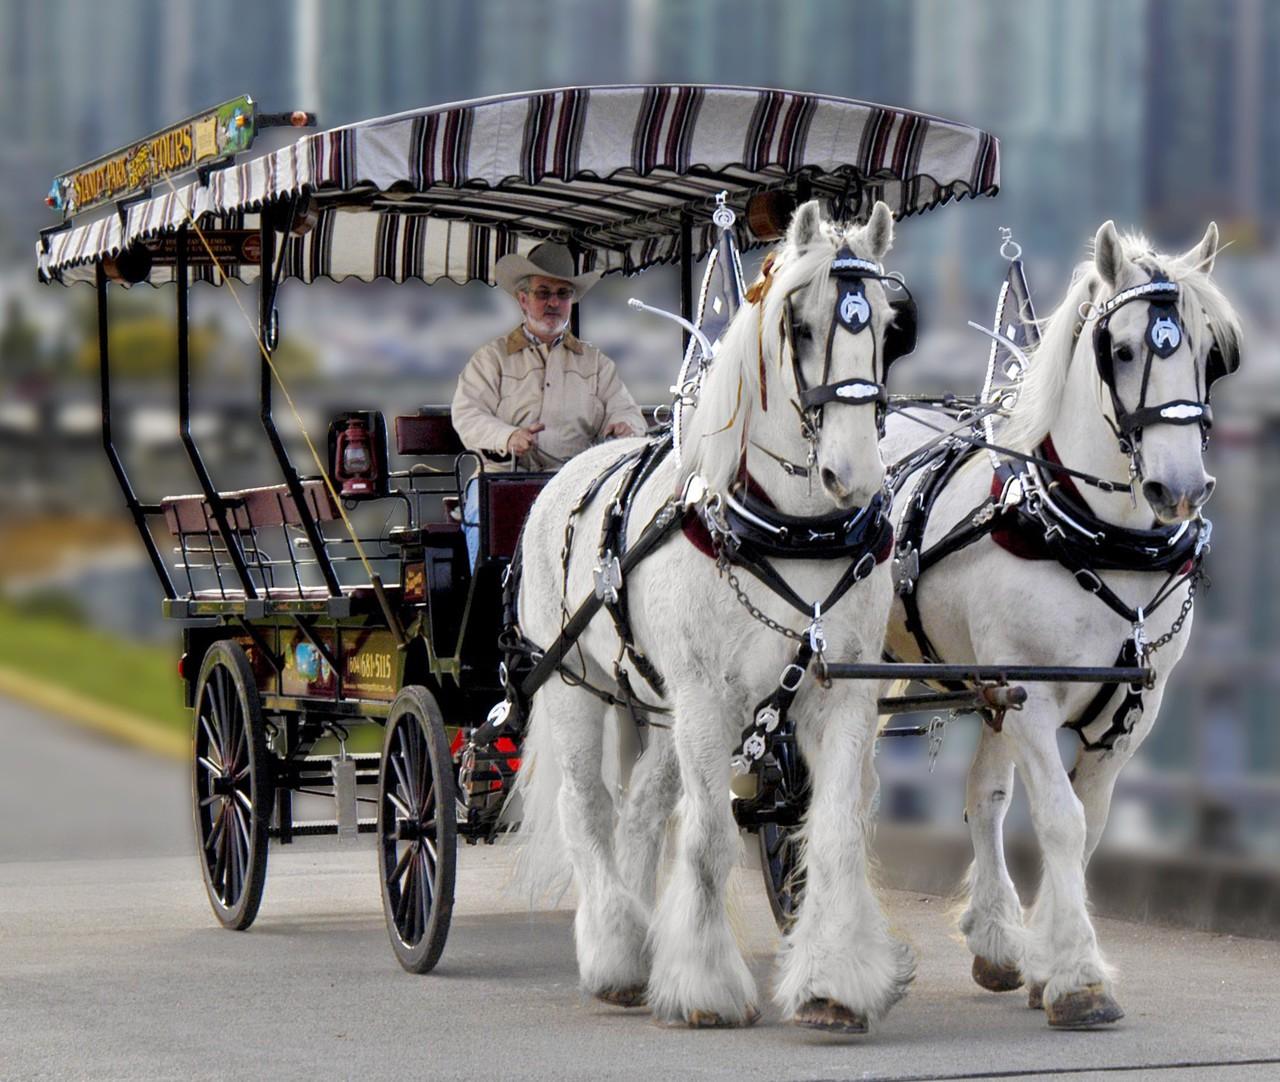 stanley park horse drawn tours